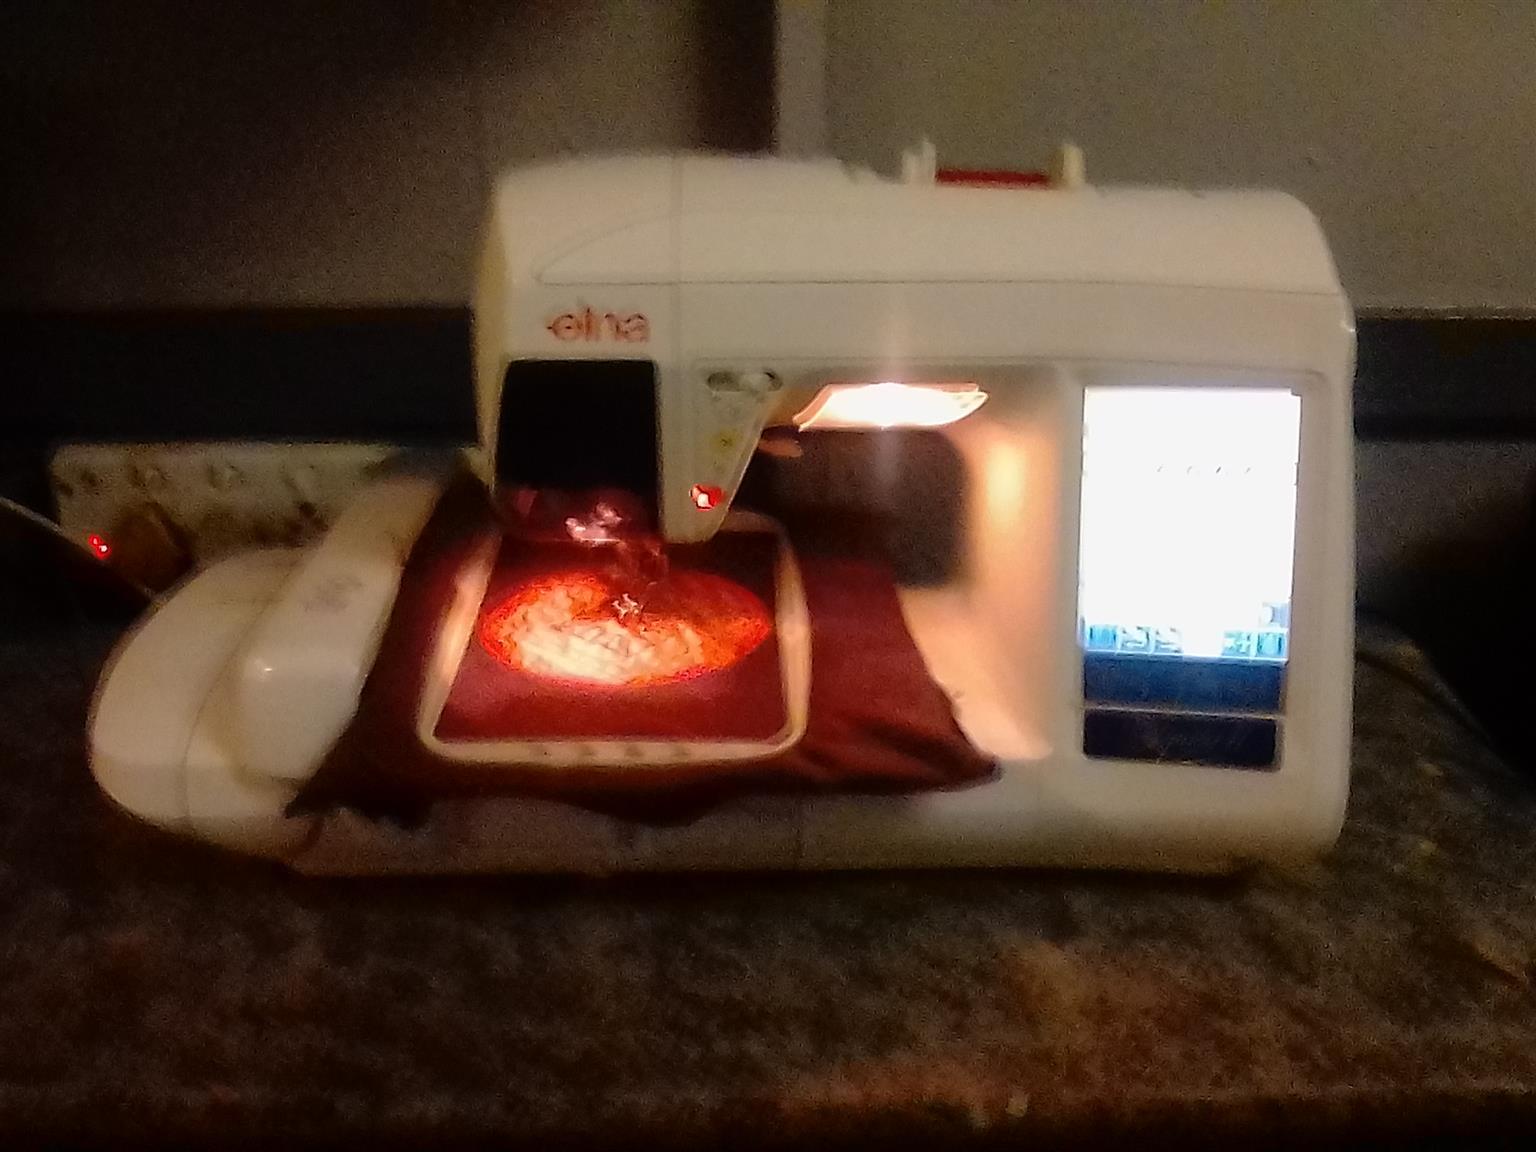 Elna Xuist ii Embroidery Machine